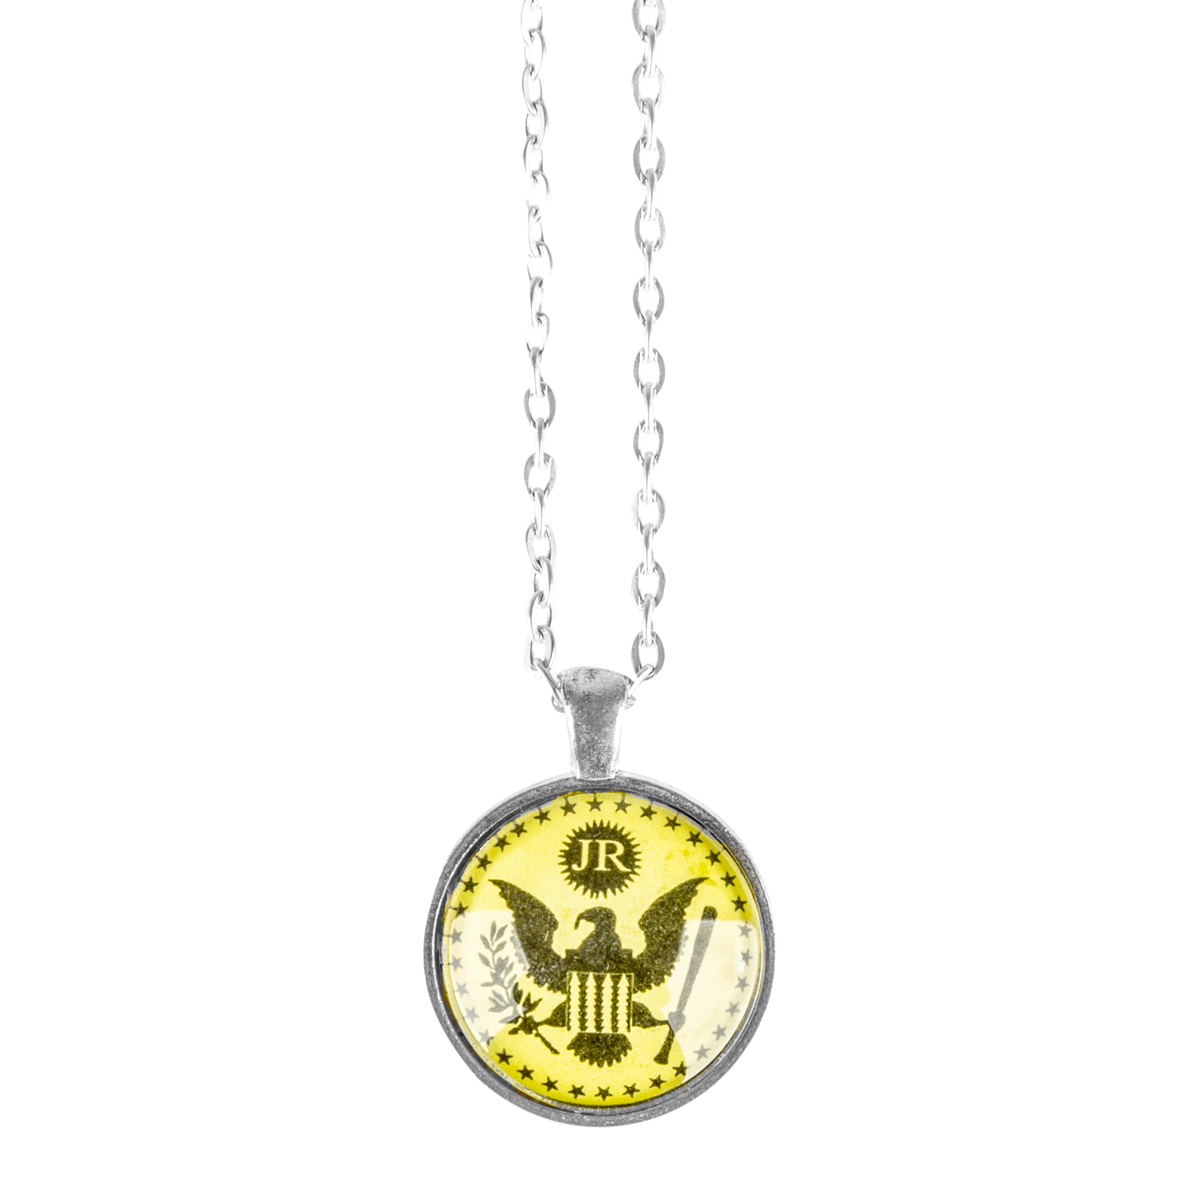 JR Eagle Necklace